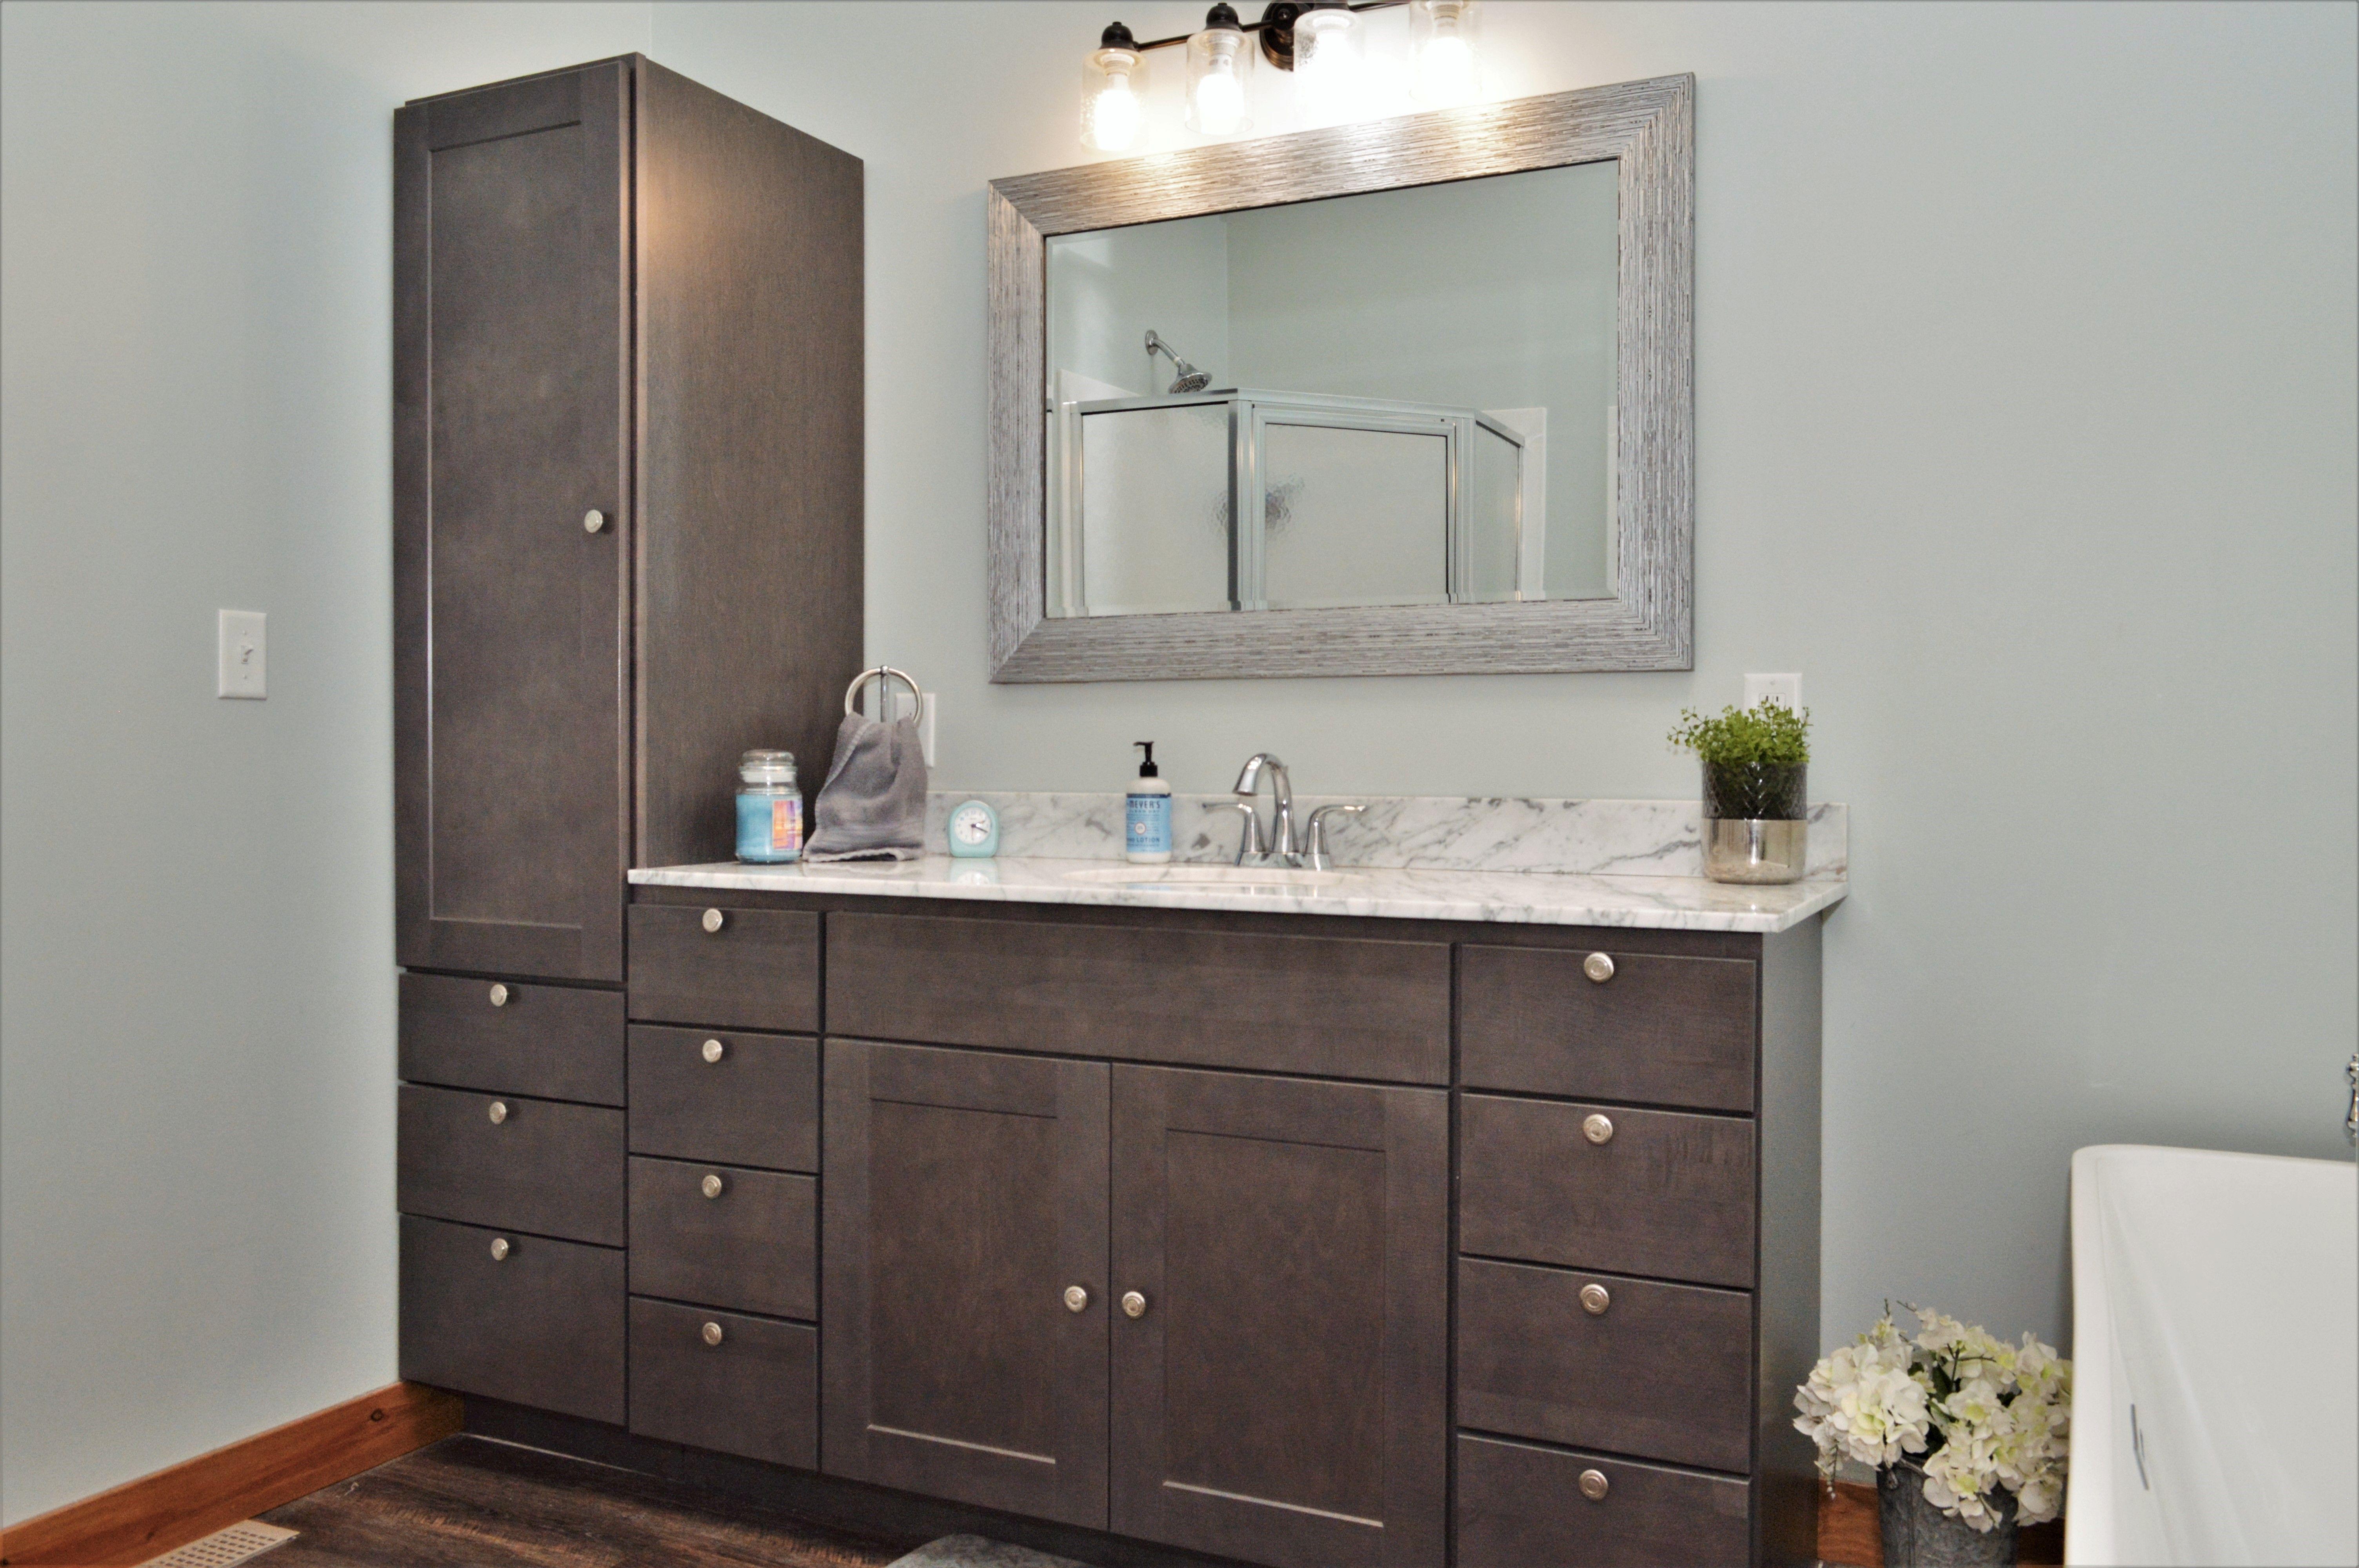 26+ Haas bathroom vanities and cabinets type